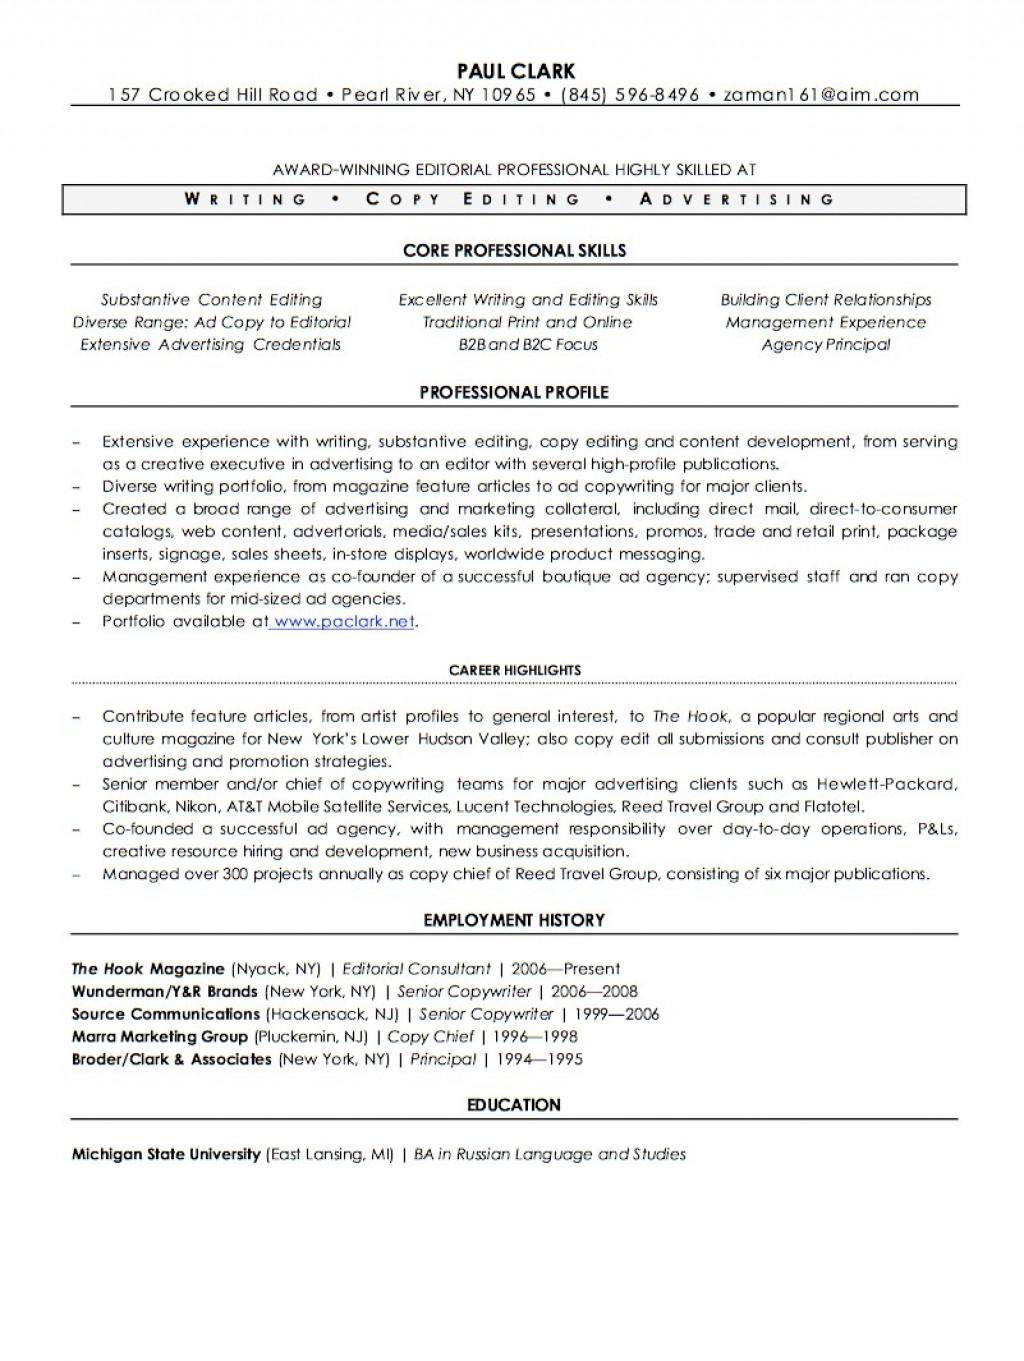 008 Pclarkresume Essay Example Writing Archaicawful Jobs Uk In Kenya Large